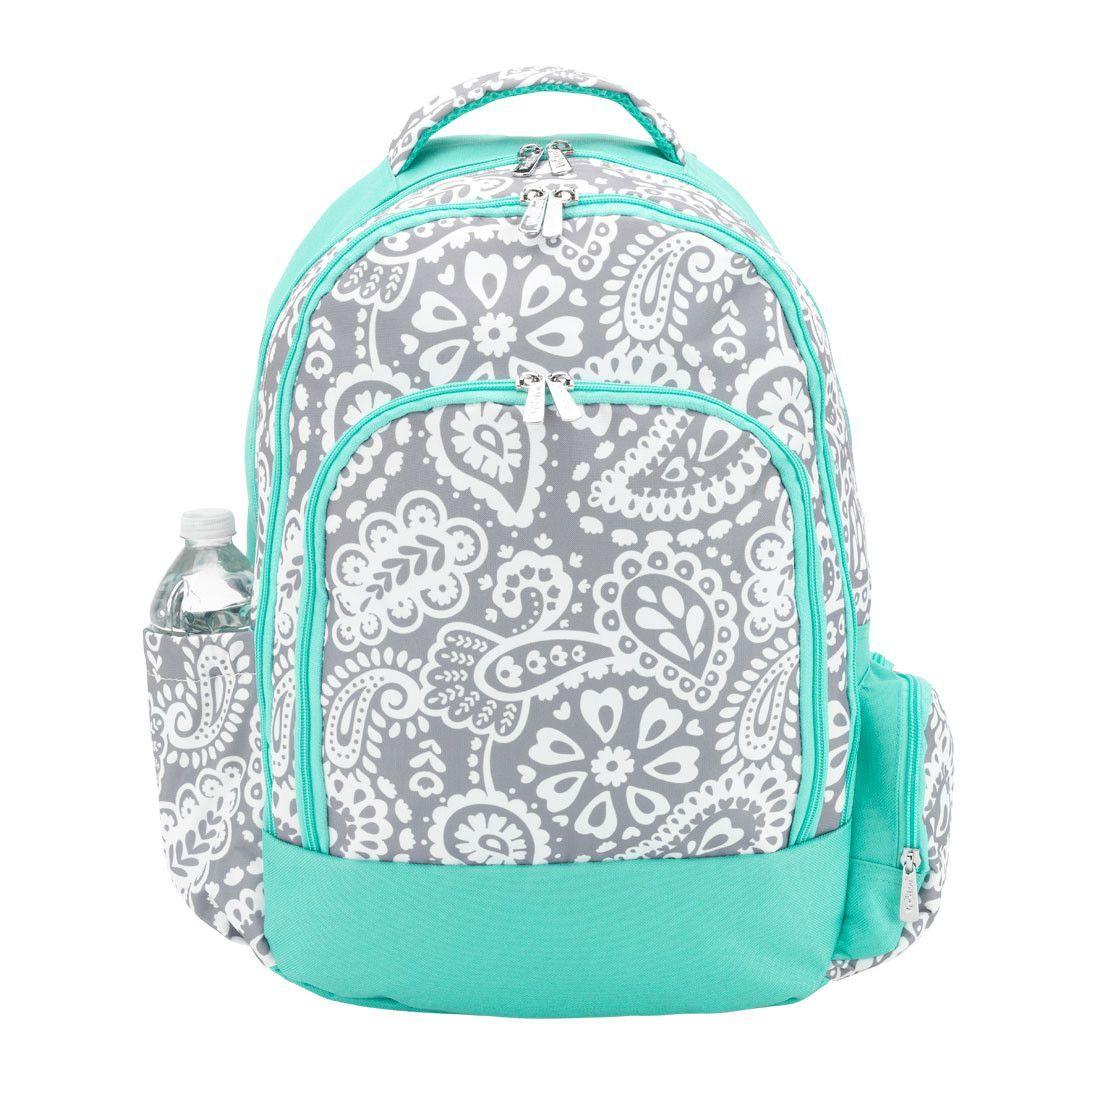 Printed Personalized Monogrammed Backpack | Monogram backpack ...